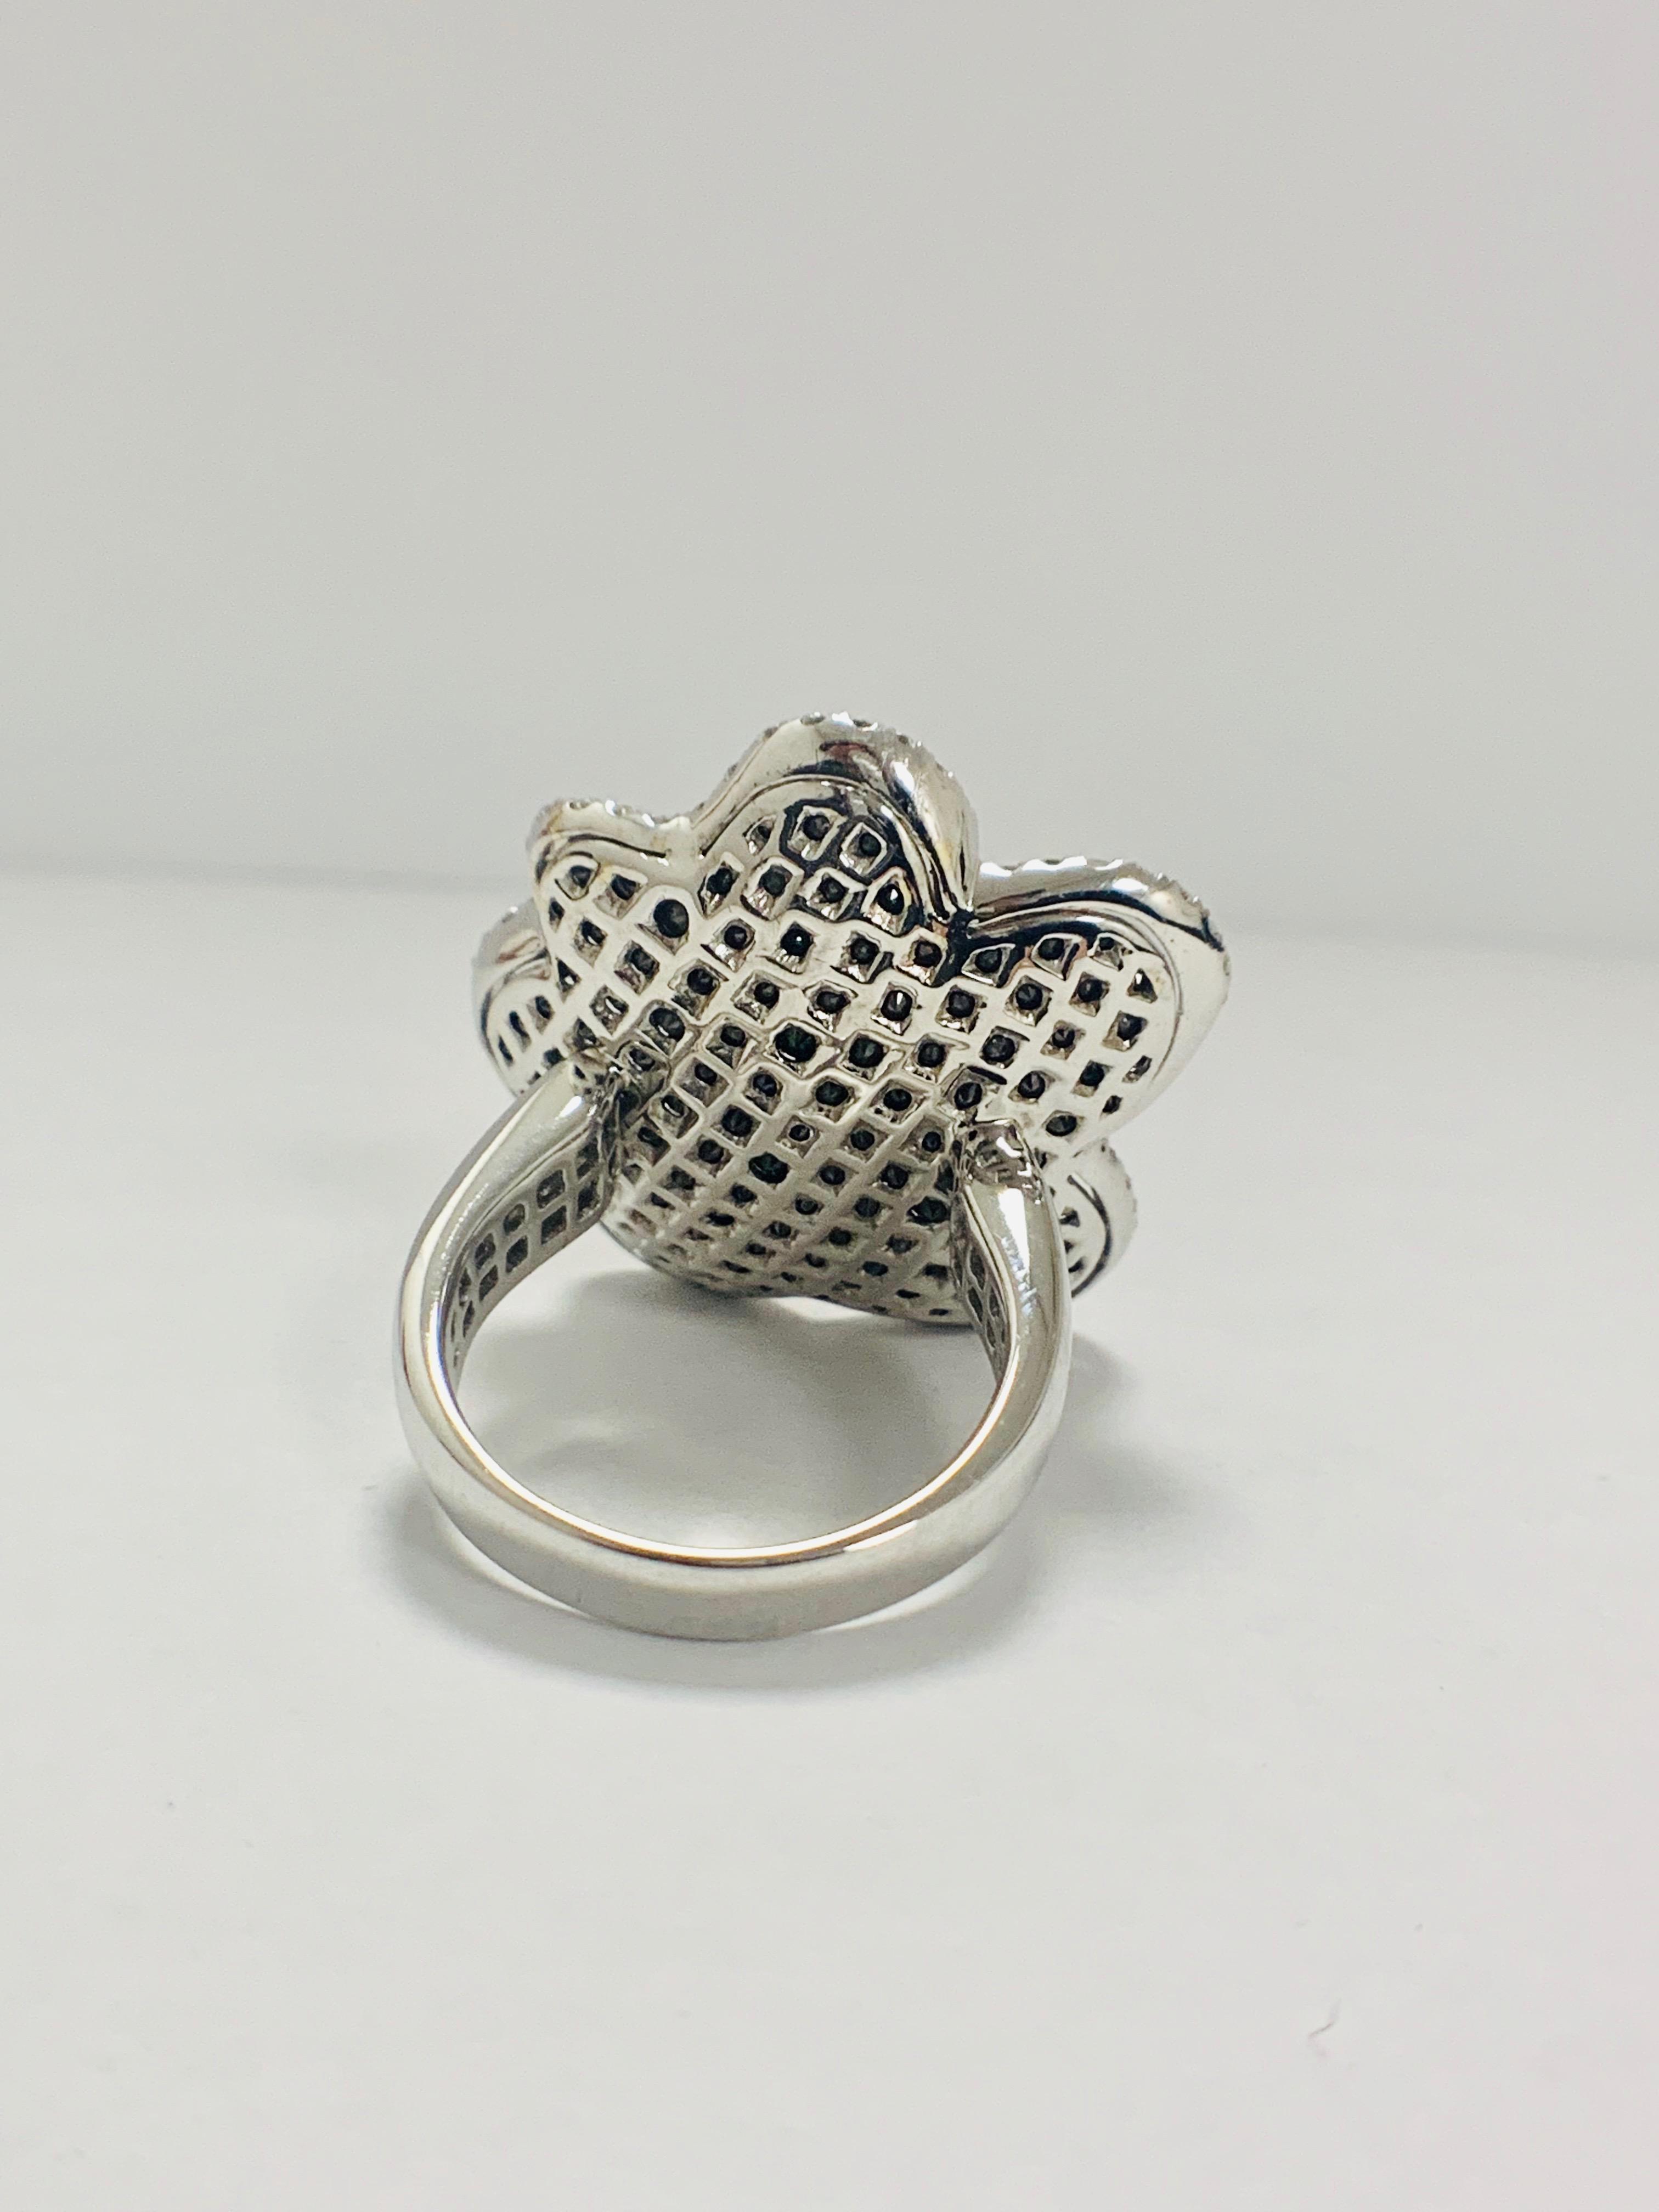 18ct White Gold Diamond flower design ring featuring 123 round cut, black Diamonds (2.25ct TBDW) - Image 5 of 13